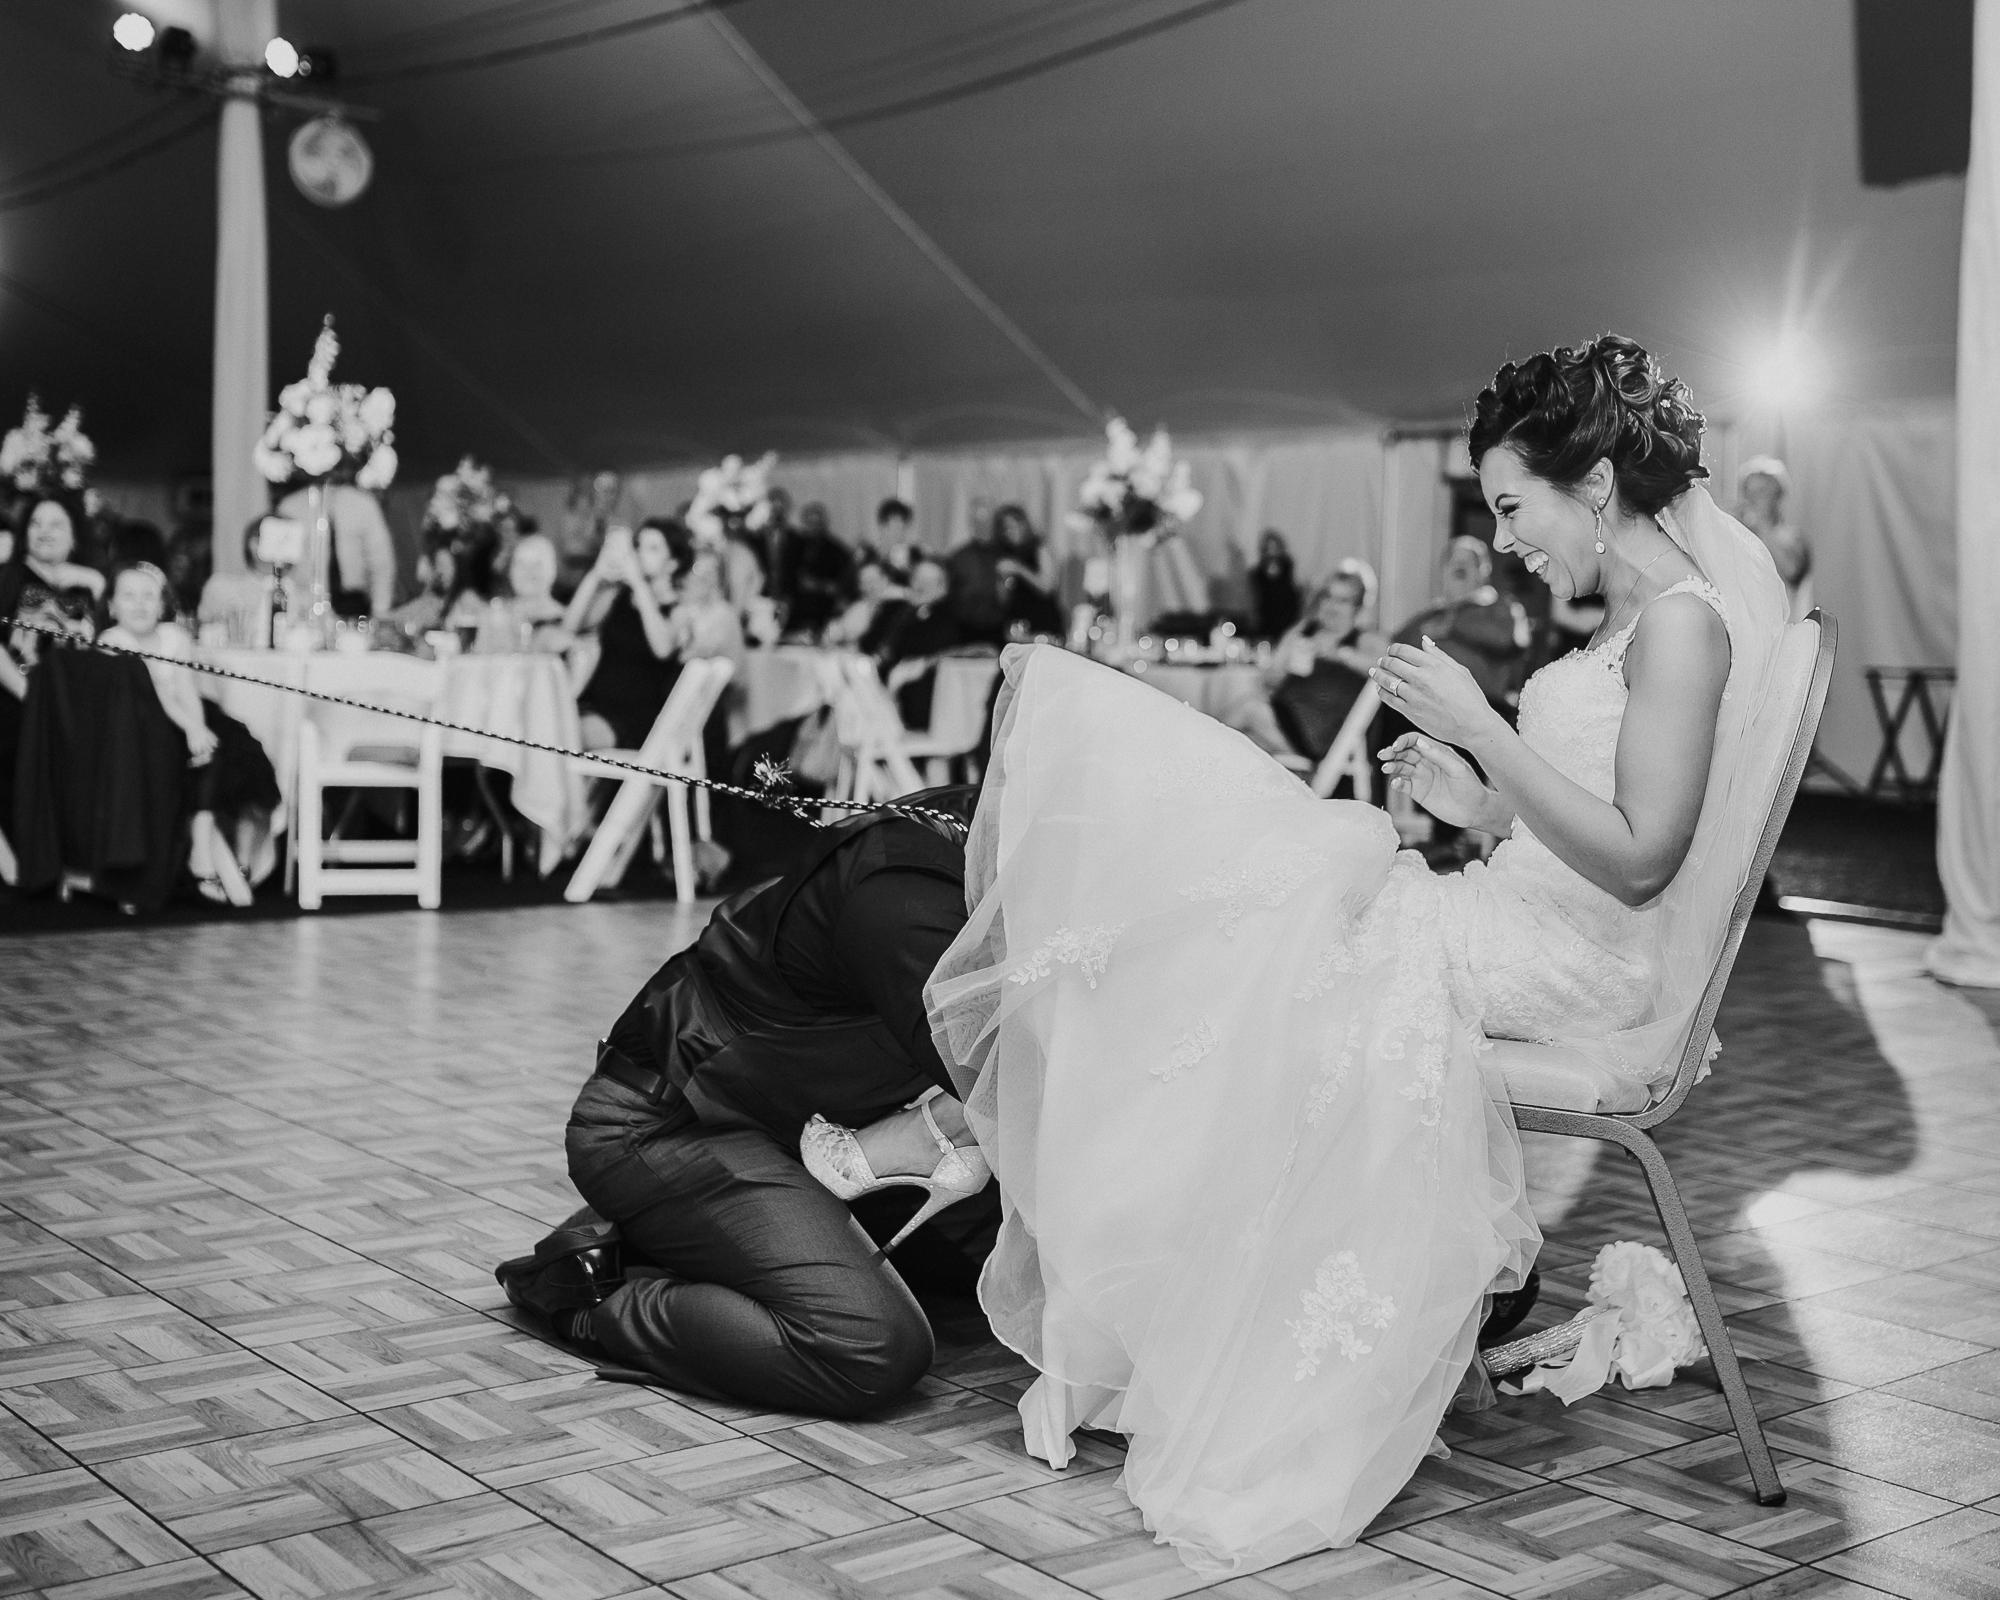 Christina-and-Gene-Wedding-Marla-Rain-Photography-573.jpg